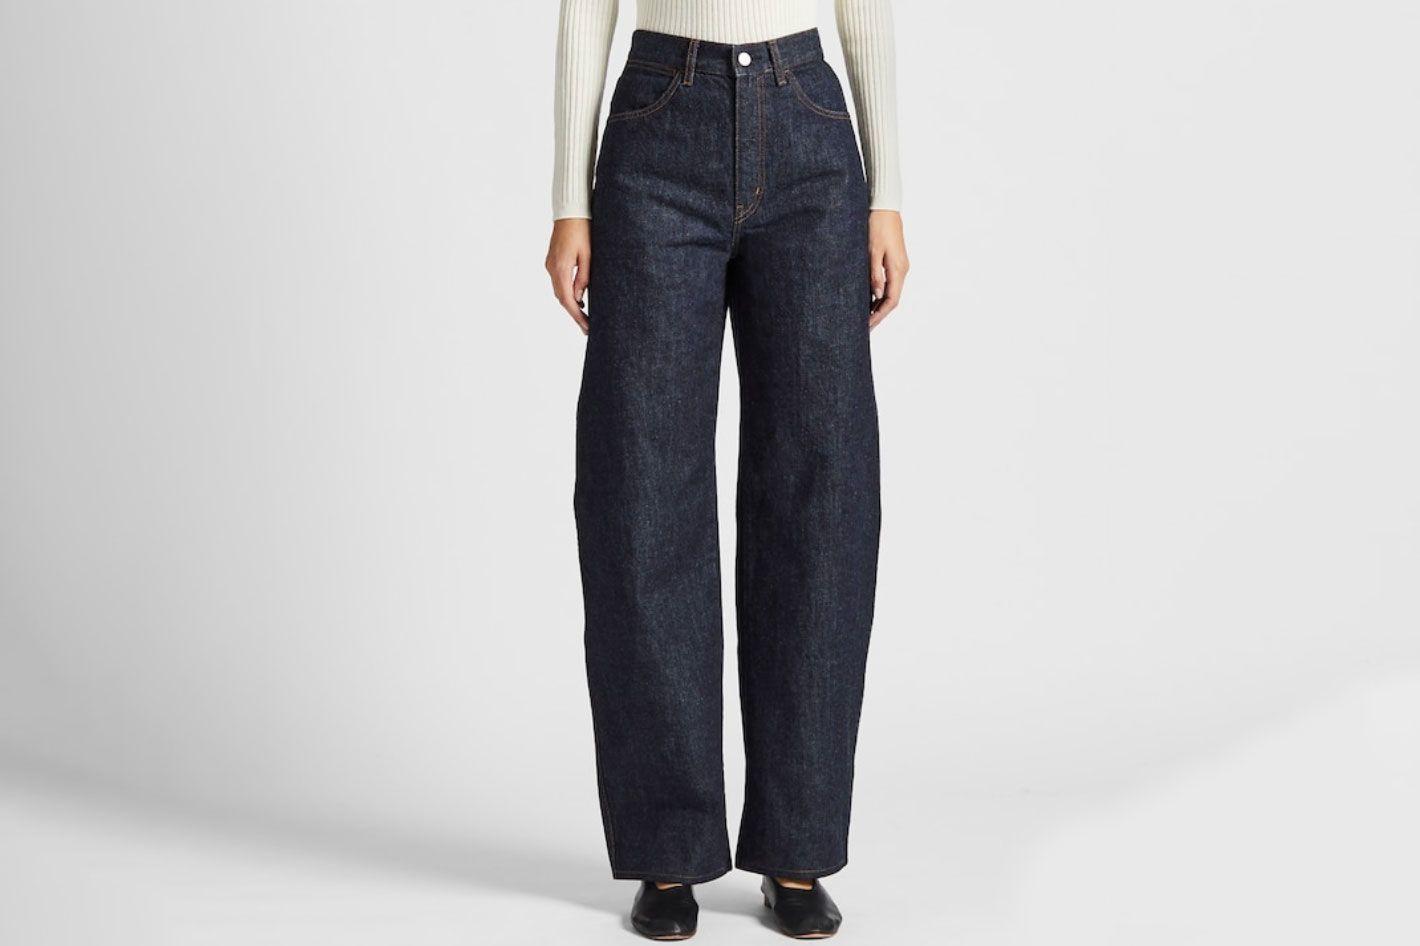 Women U Wide-Fit Curved Jeans